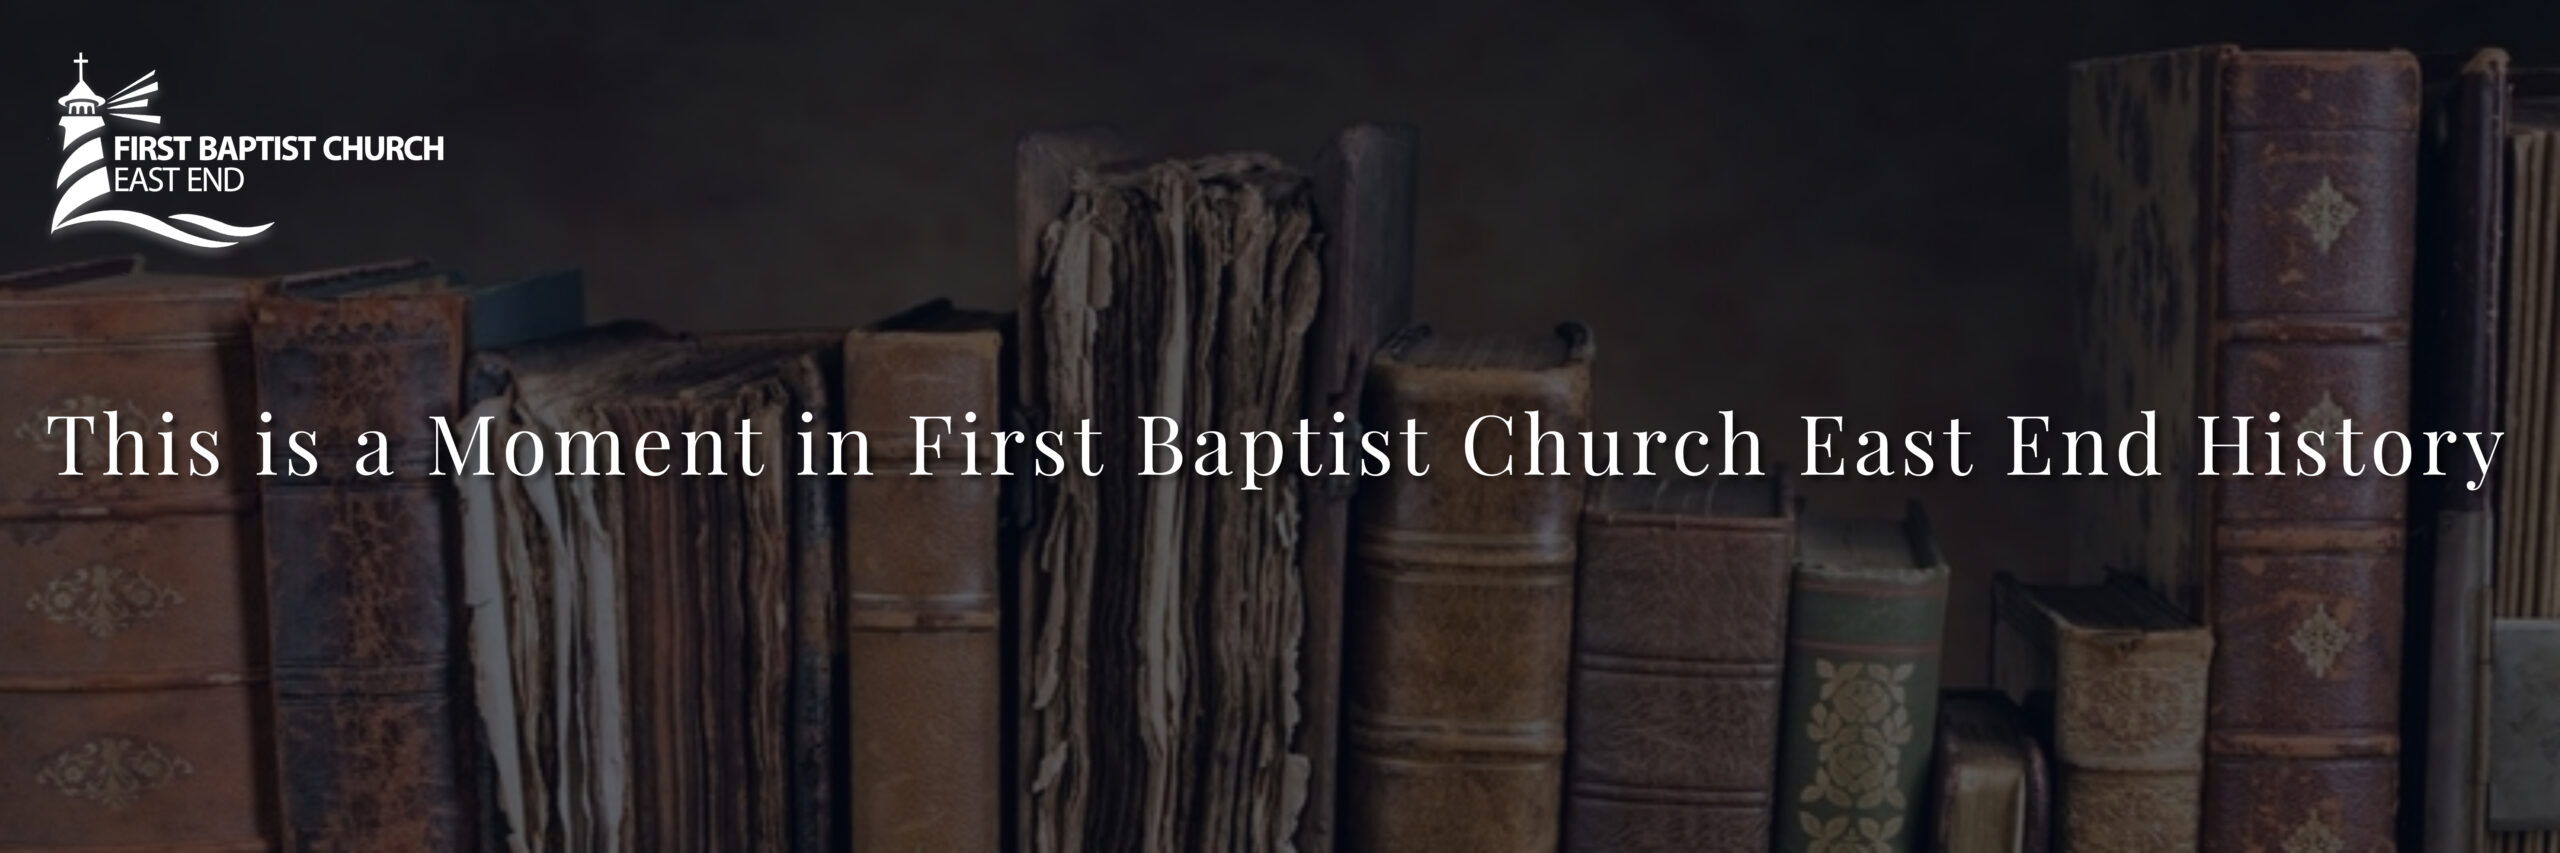 Copy of church flyer